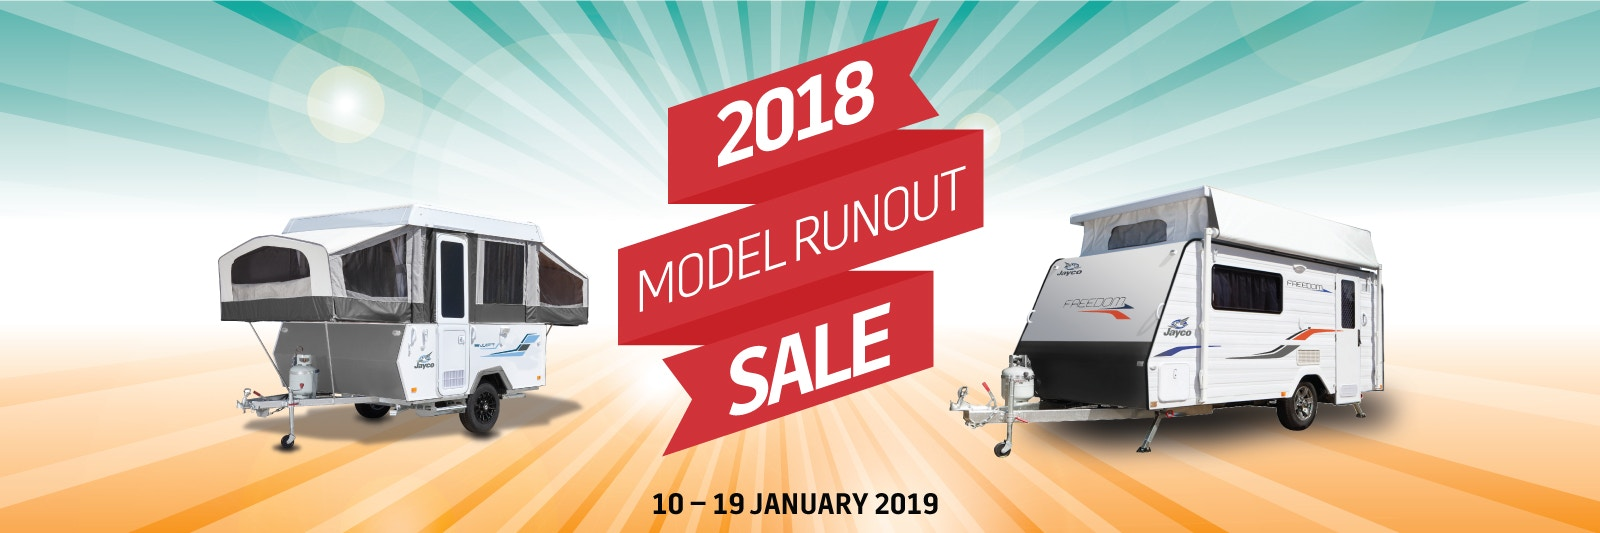 2018 Model Runout Sale